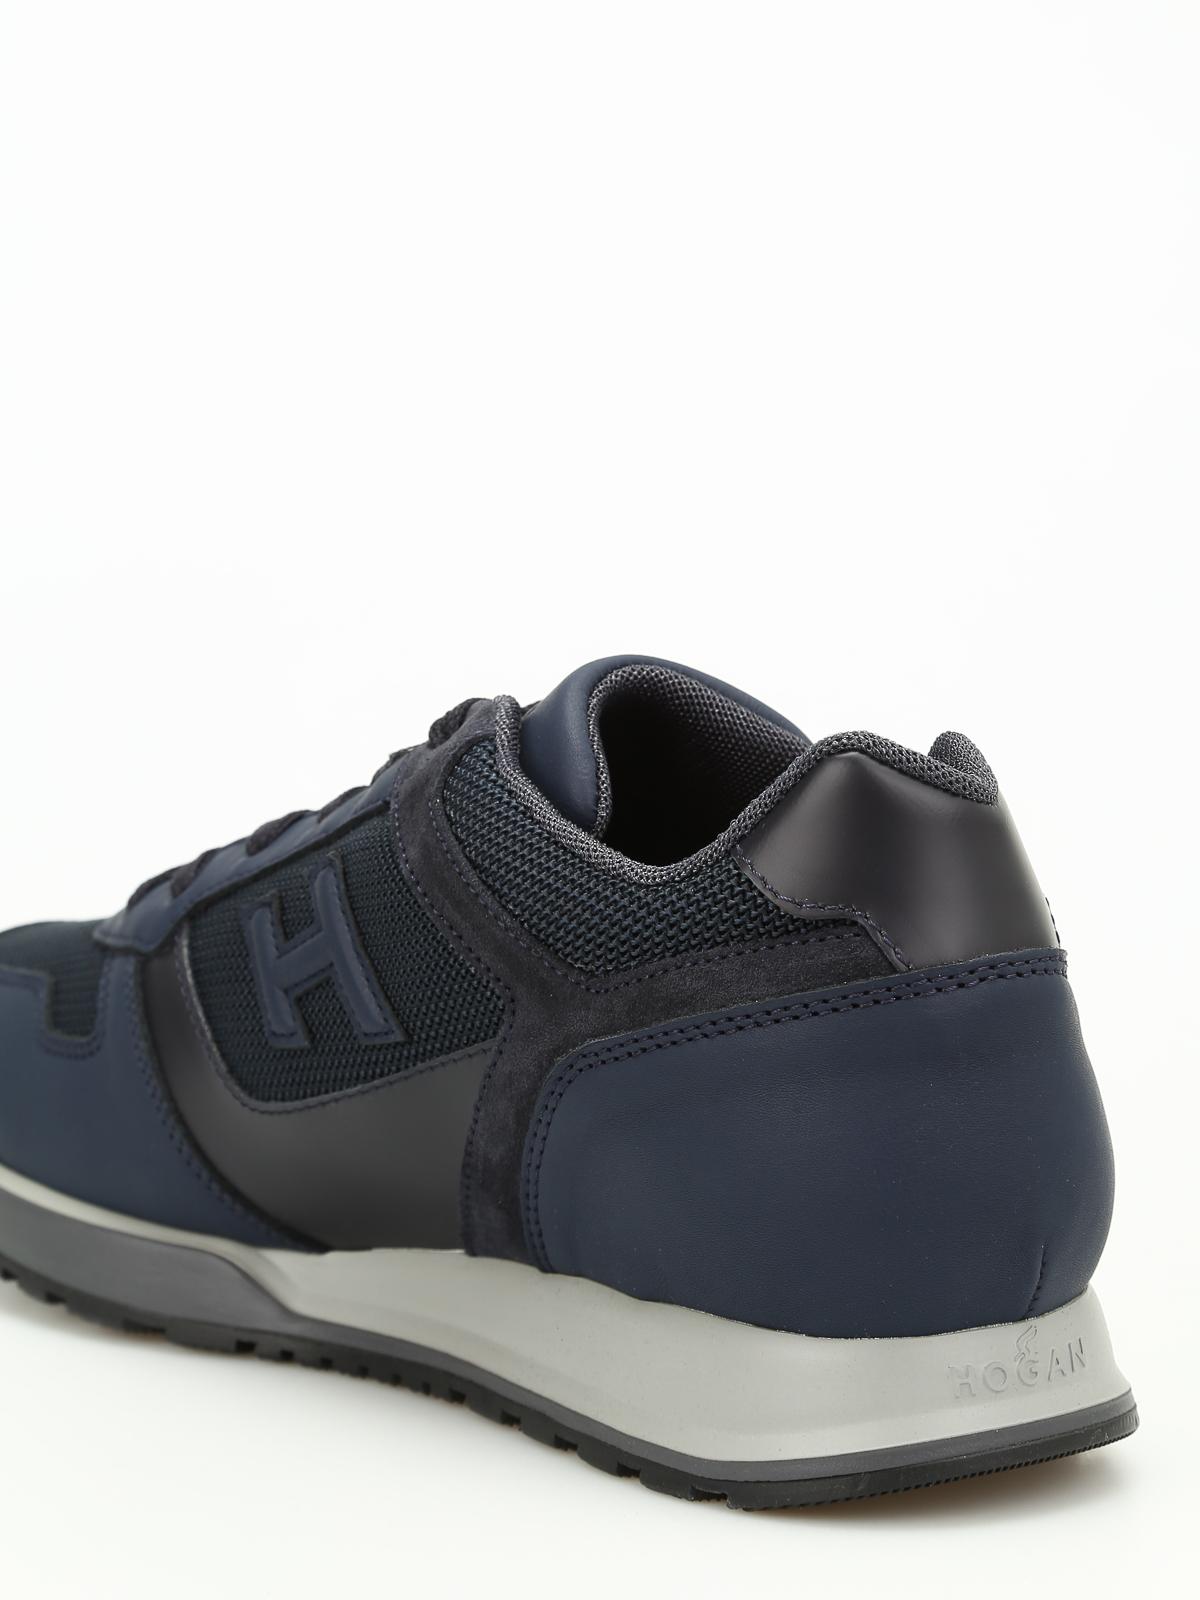 Trainers Hogan - H321 sneakers - HXM3210Y850HIF9AZC   Shop online ...